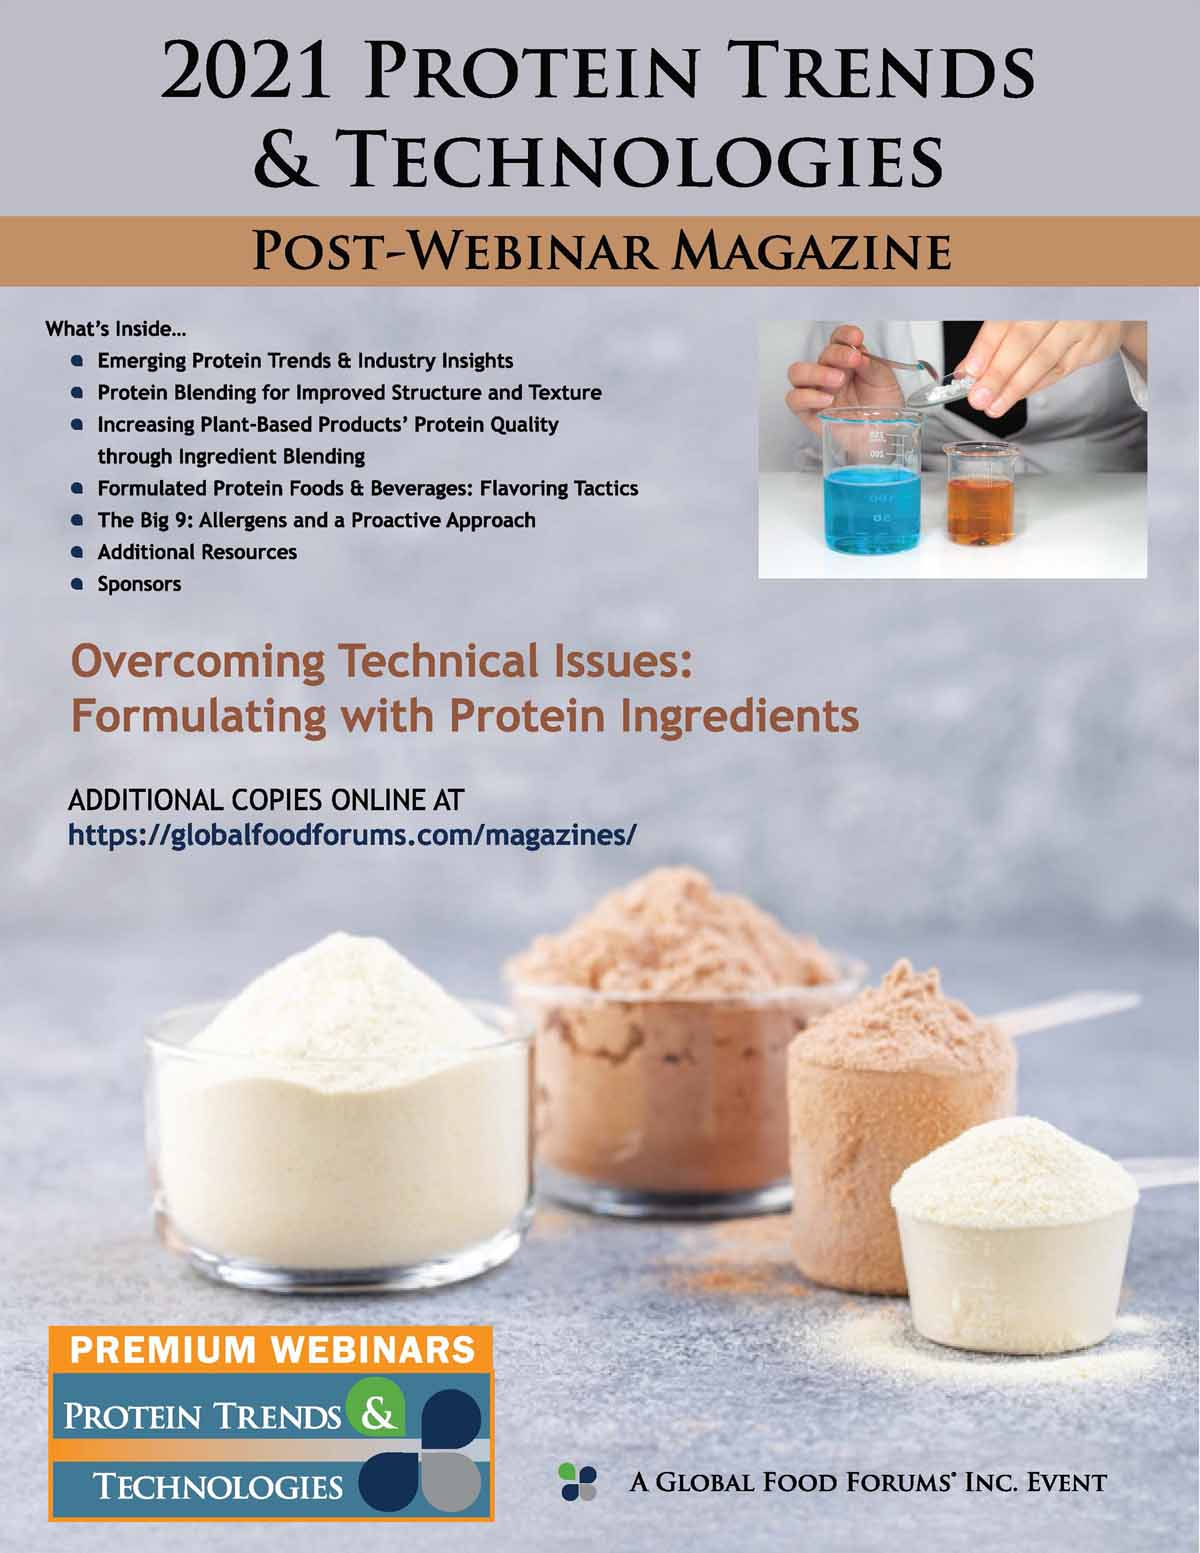 2021-Protein-Trends-Technologies-webinar-magazine-COVER